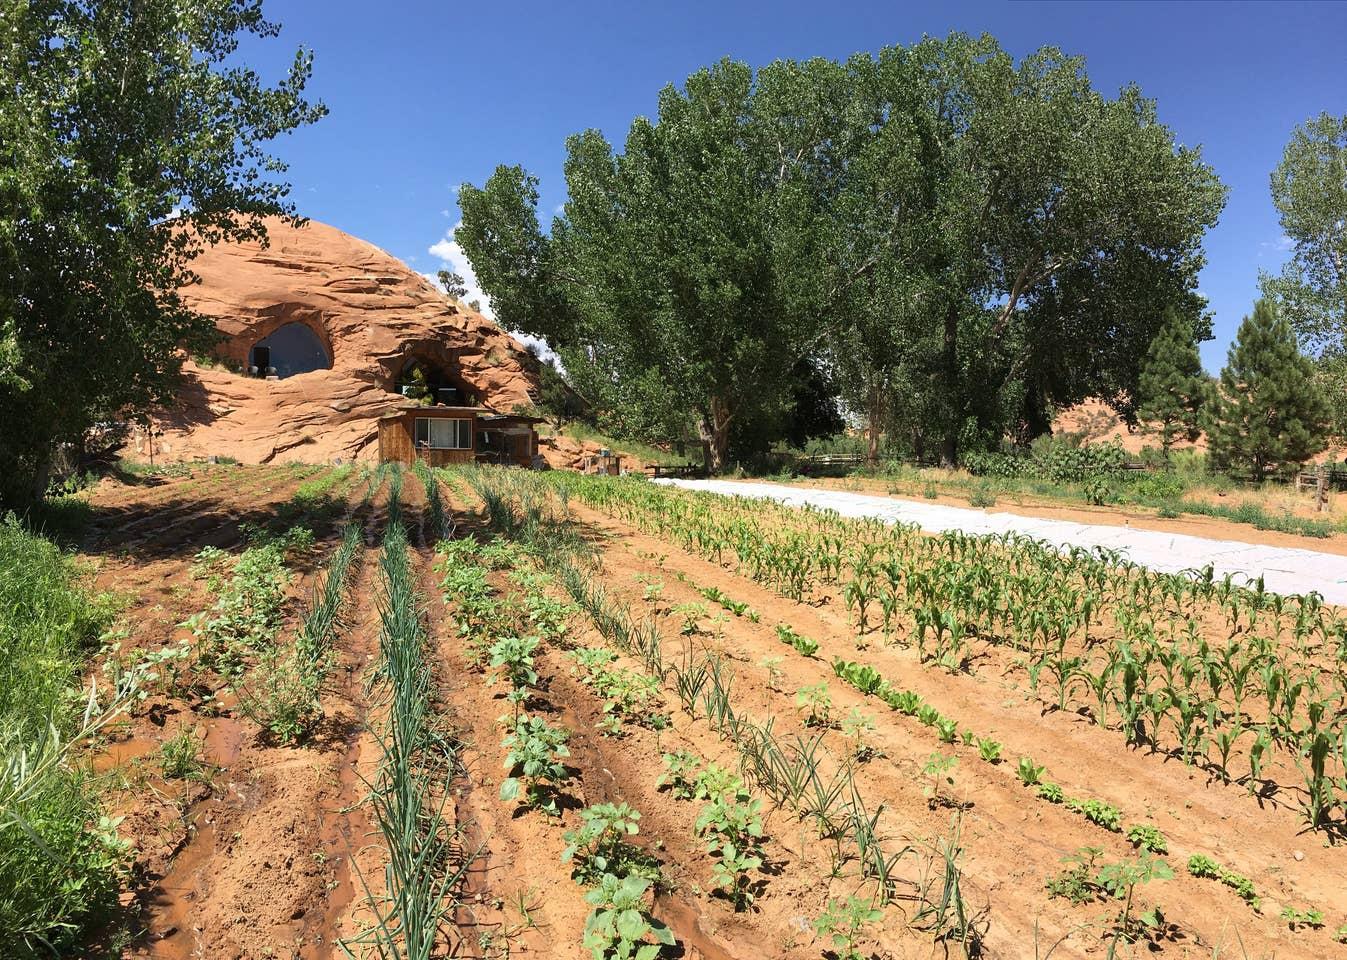 Most Unique USA Airbnbs Navajo sandstone home cave Boulder Utah garden